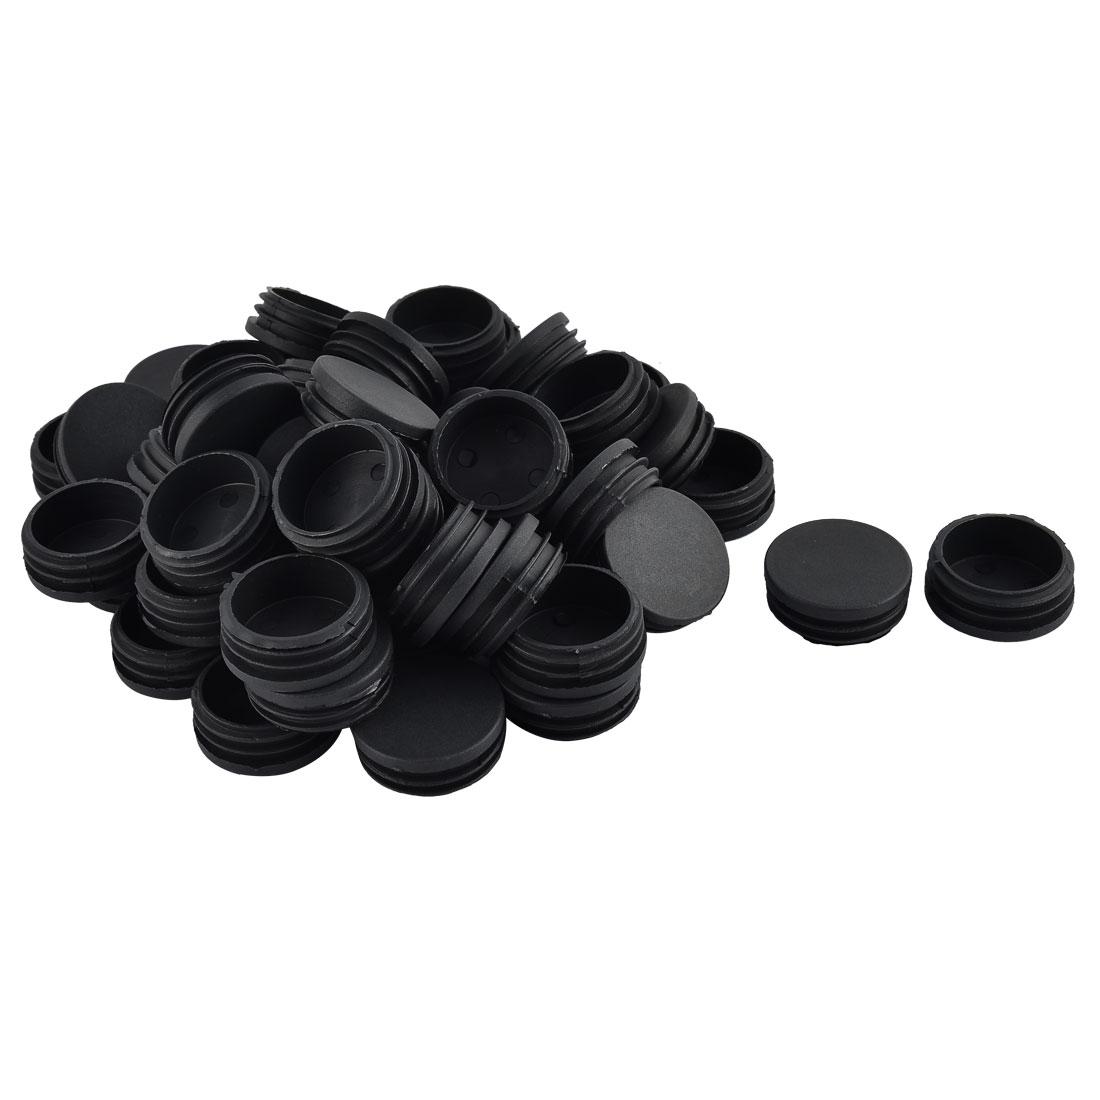 Furniture Table Chair Legs Plastic Round Tube Insert Cap Cover Black 45mm Dia 50pcs